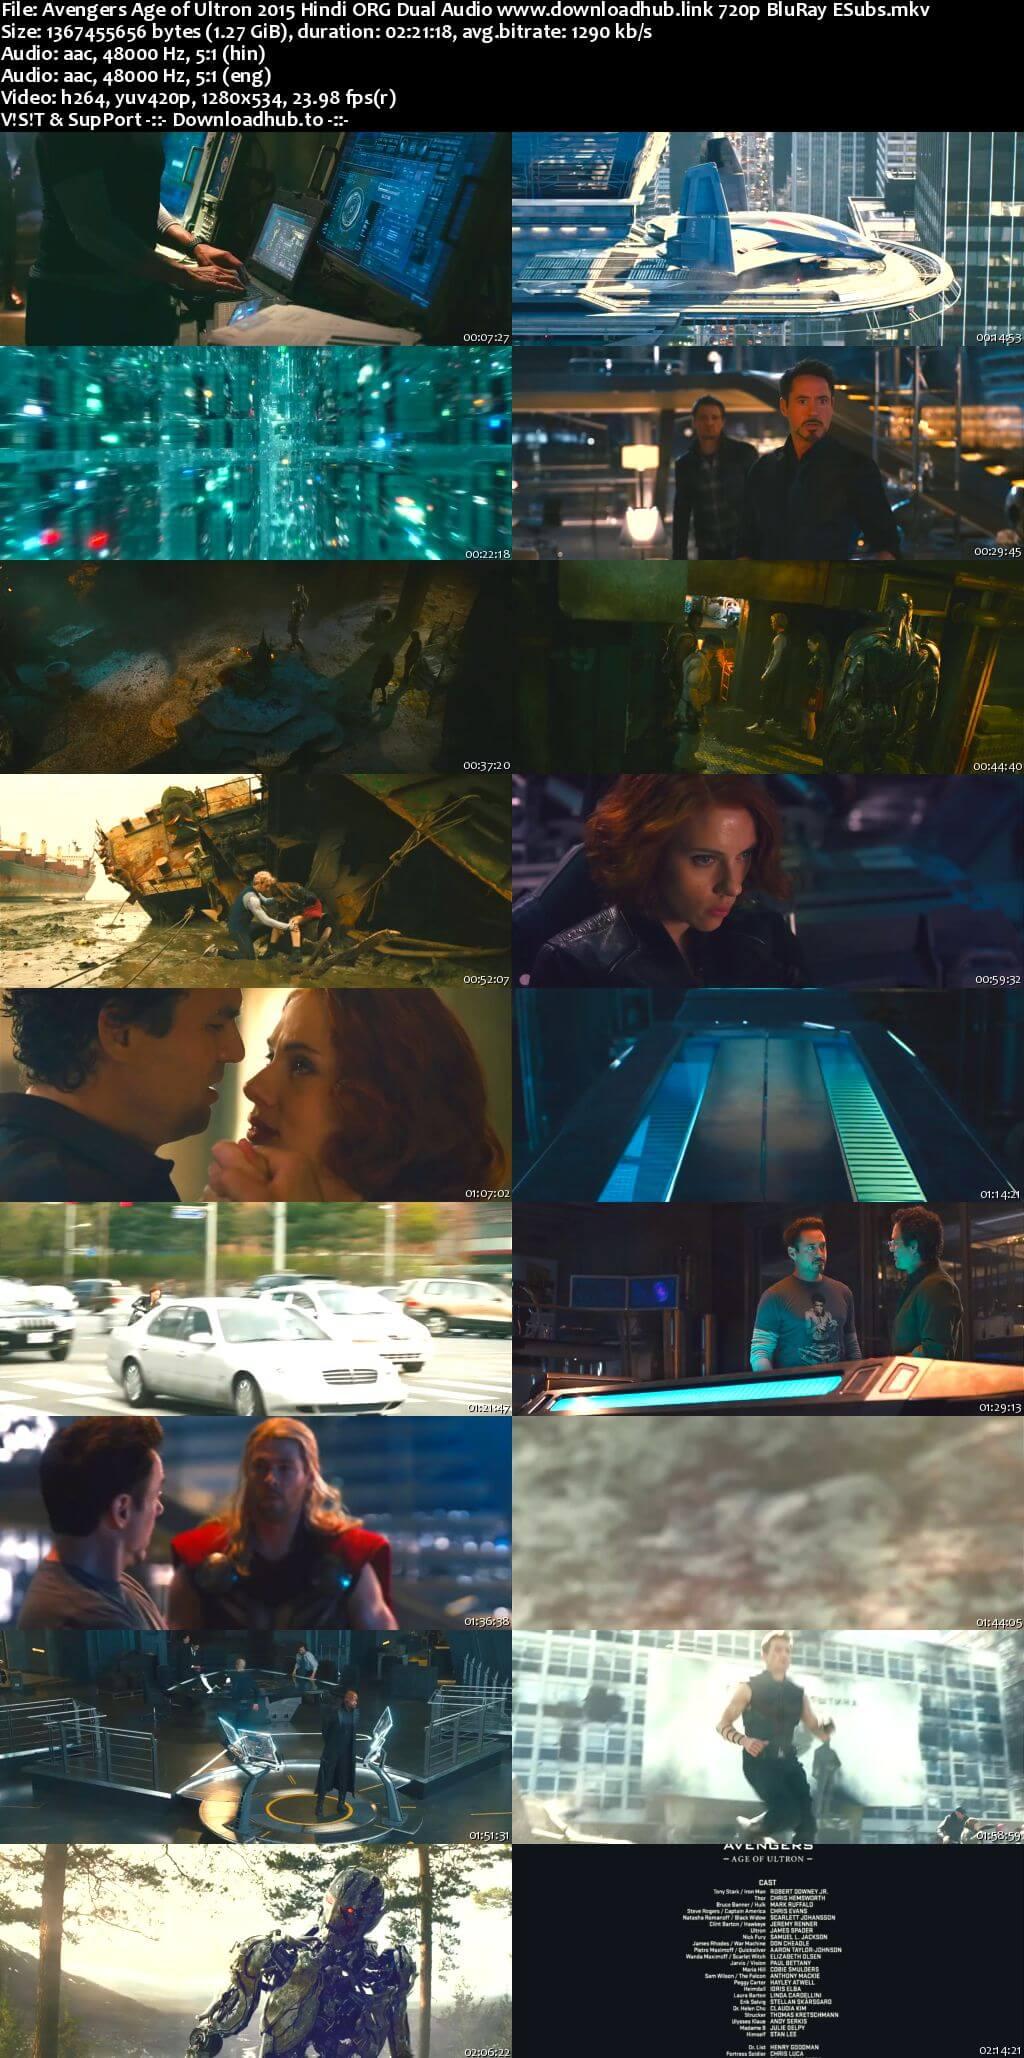 Avengers Age of Ultron 2015 Hindi ORG Dual Audio 720p BluRay ESubs